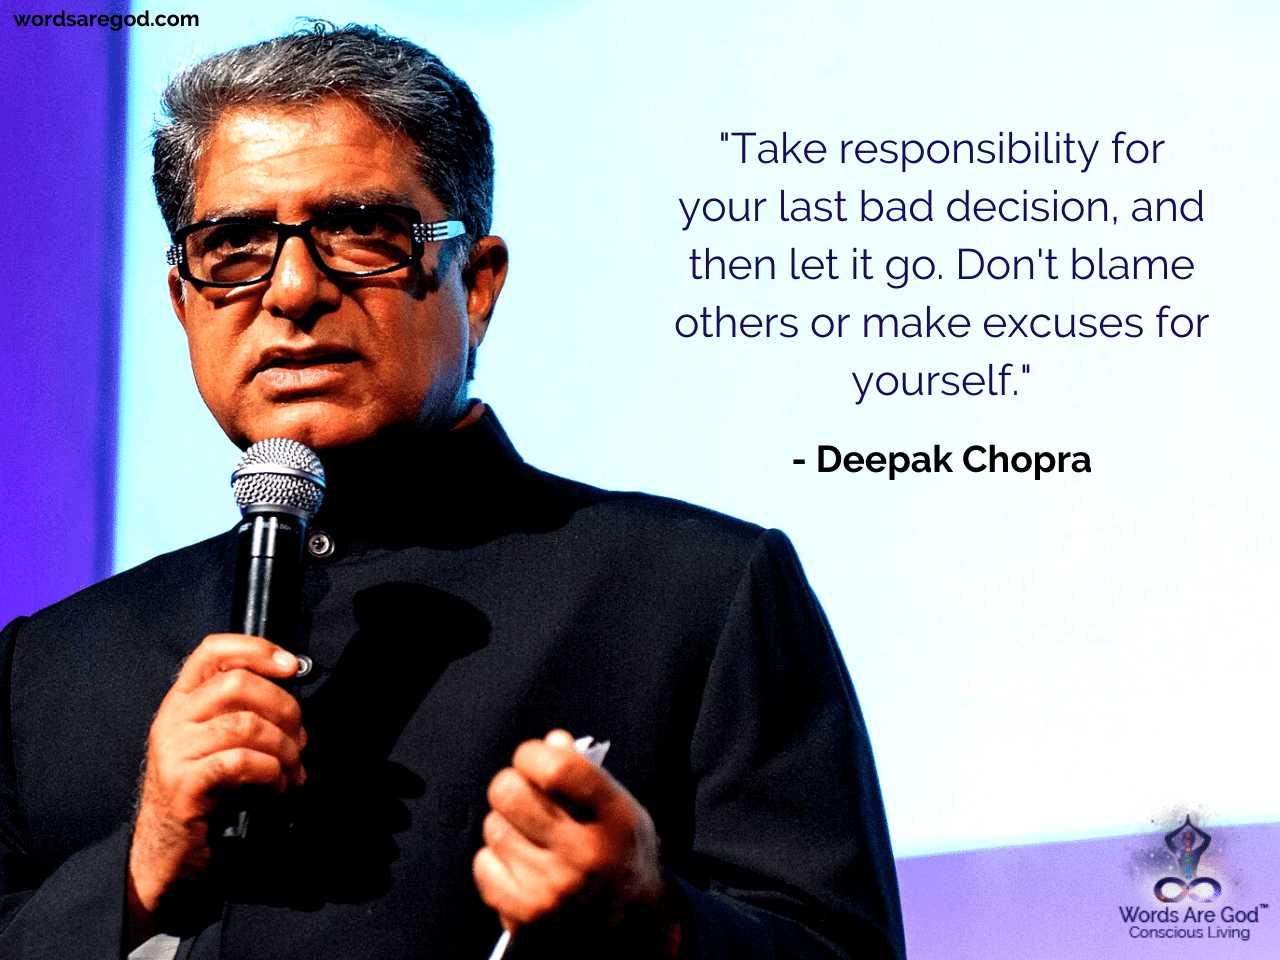 Deepak Chopra Motivational Quote by Deepak Chopra